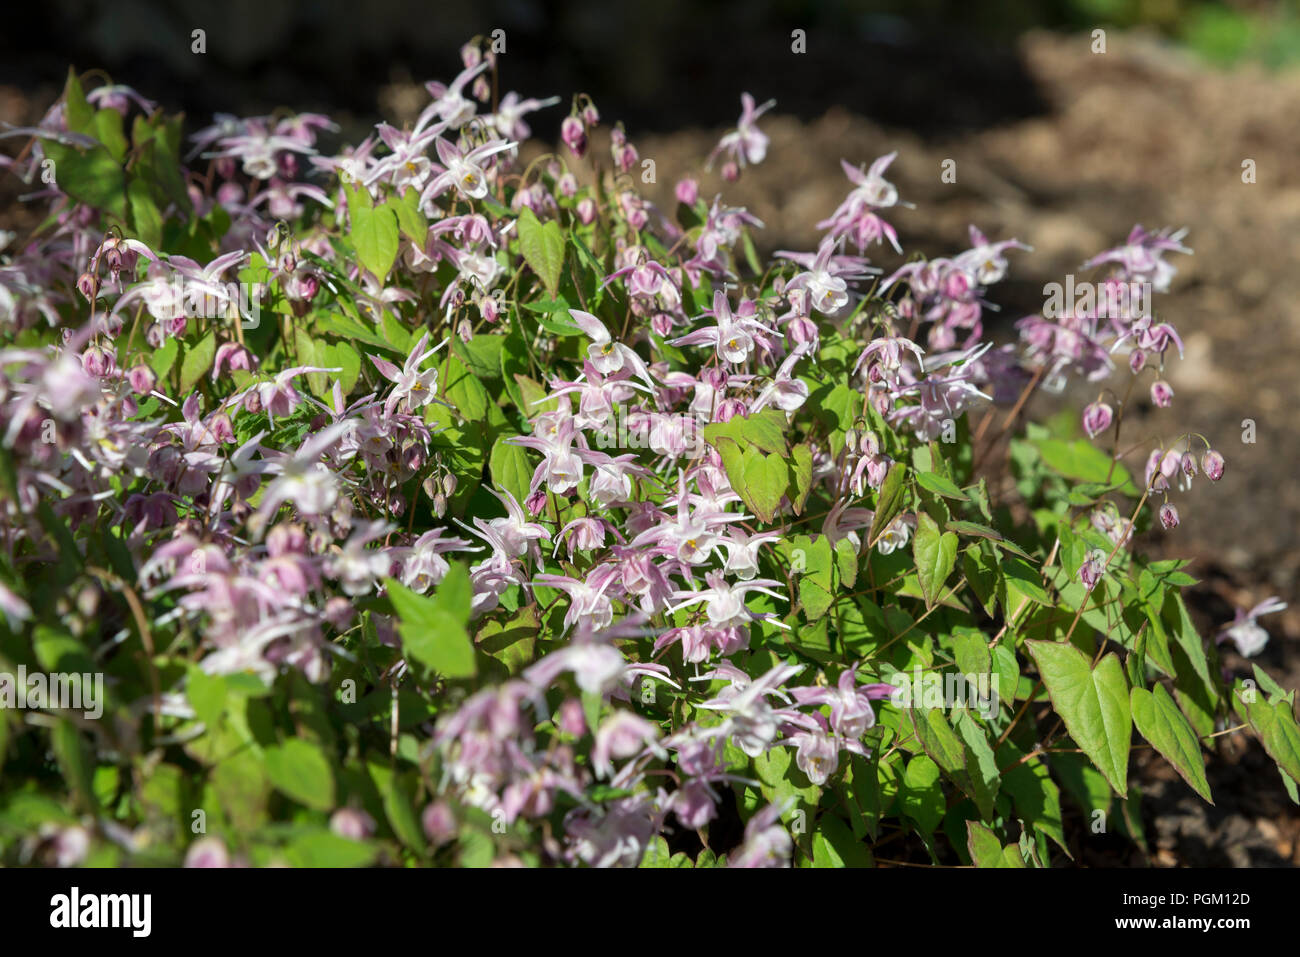 Epimedium Akebono A Dainty Spring Flowering Perennial Plant With